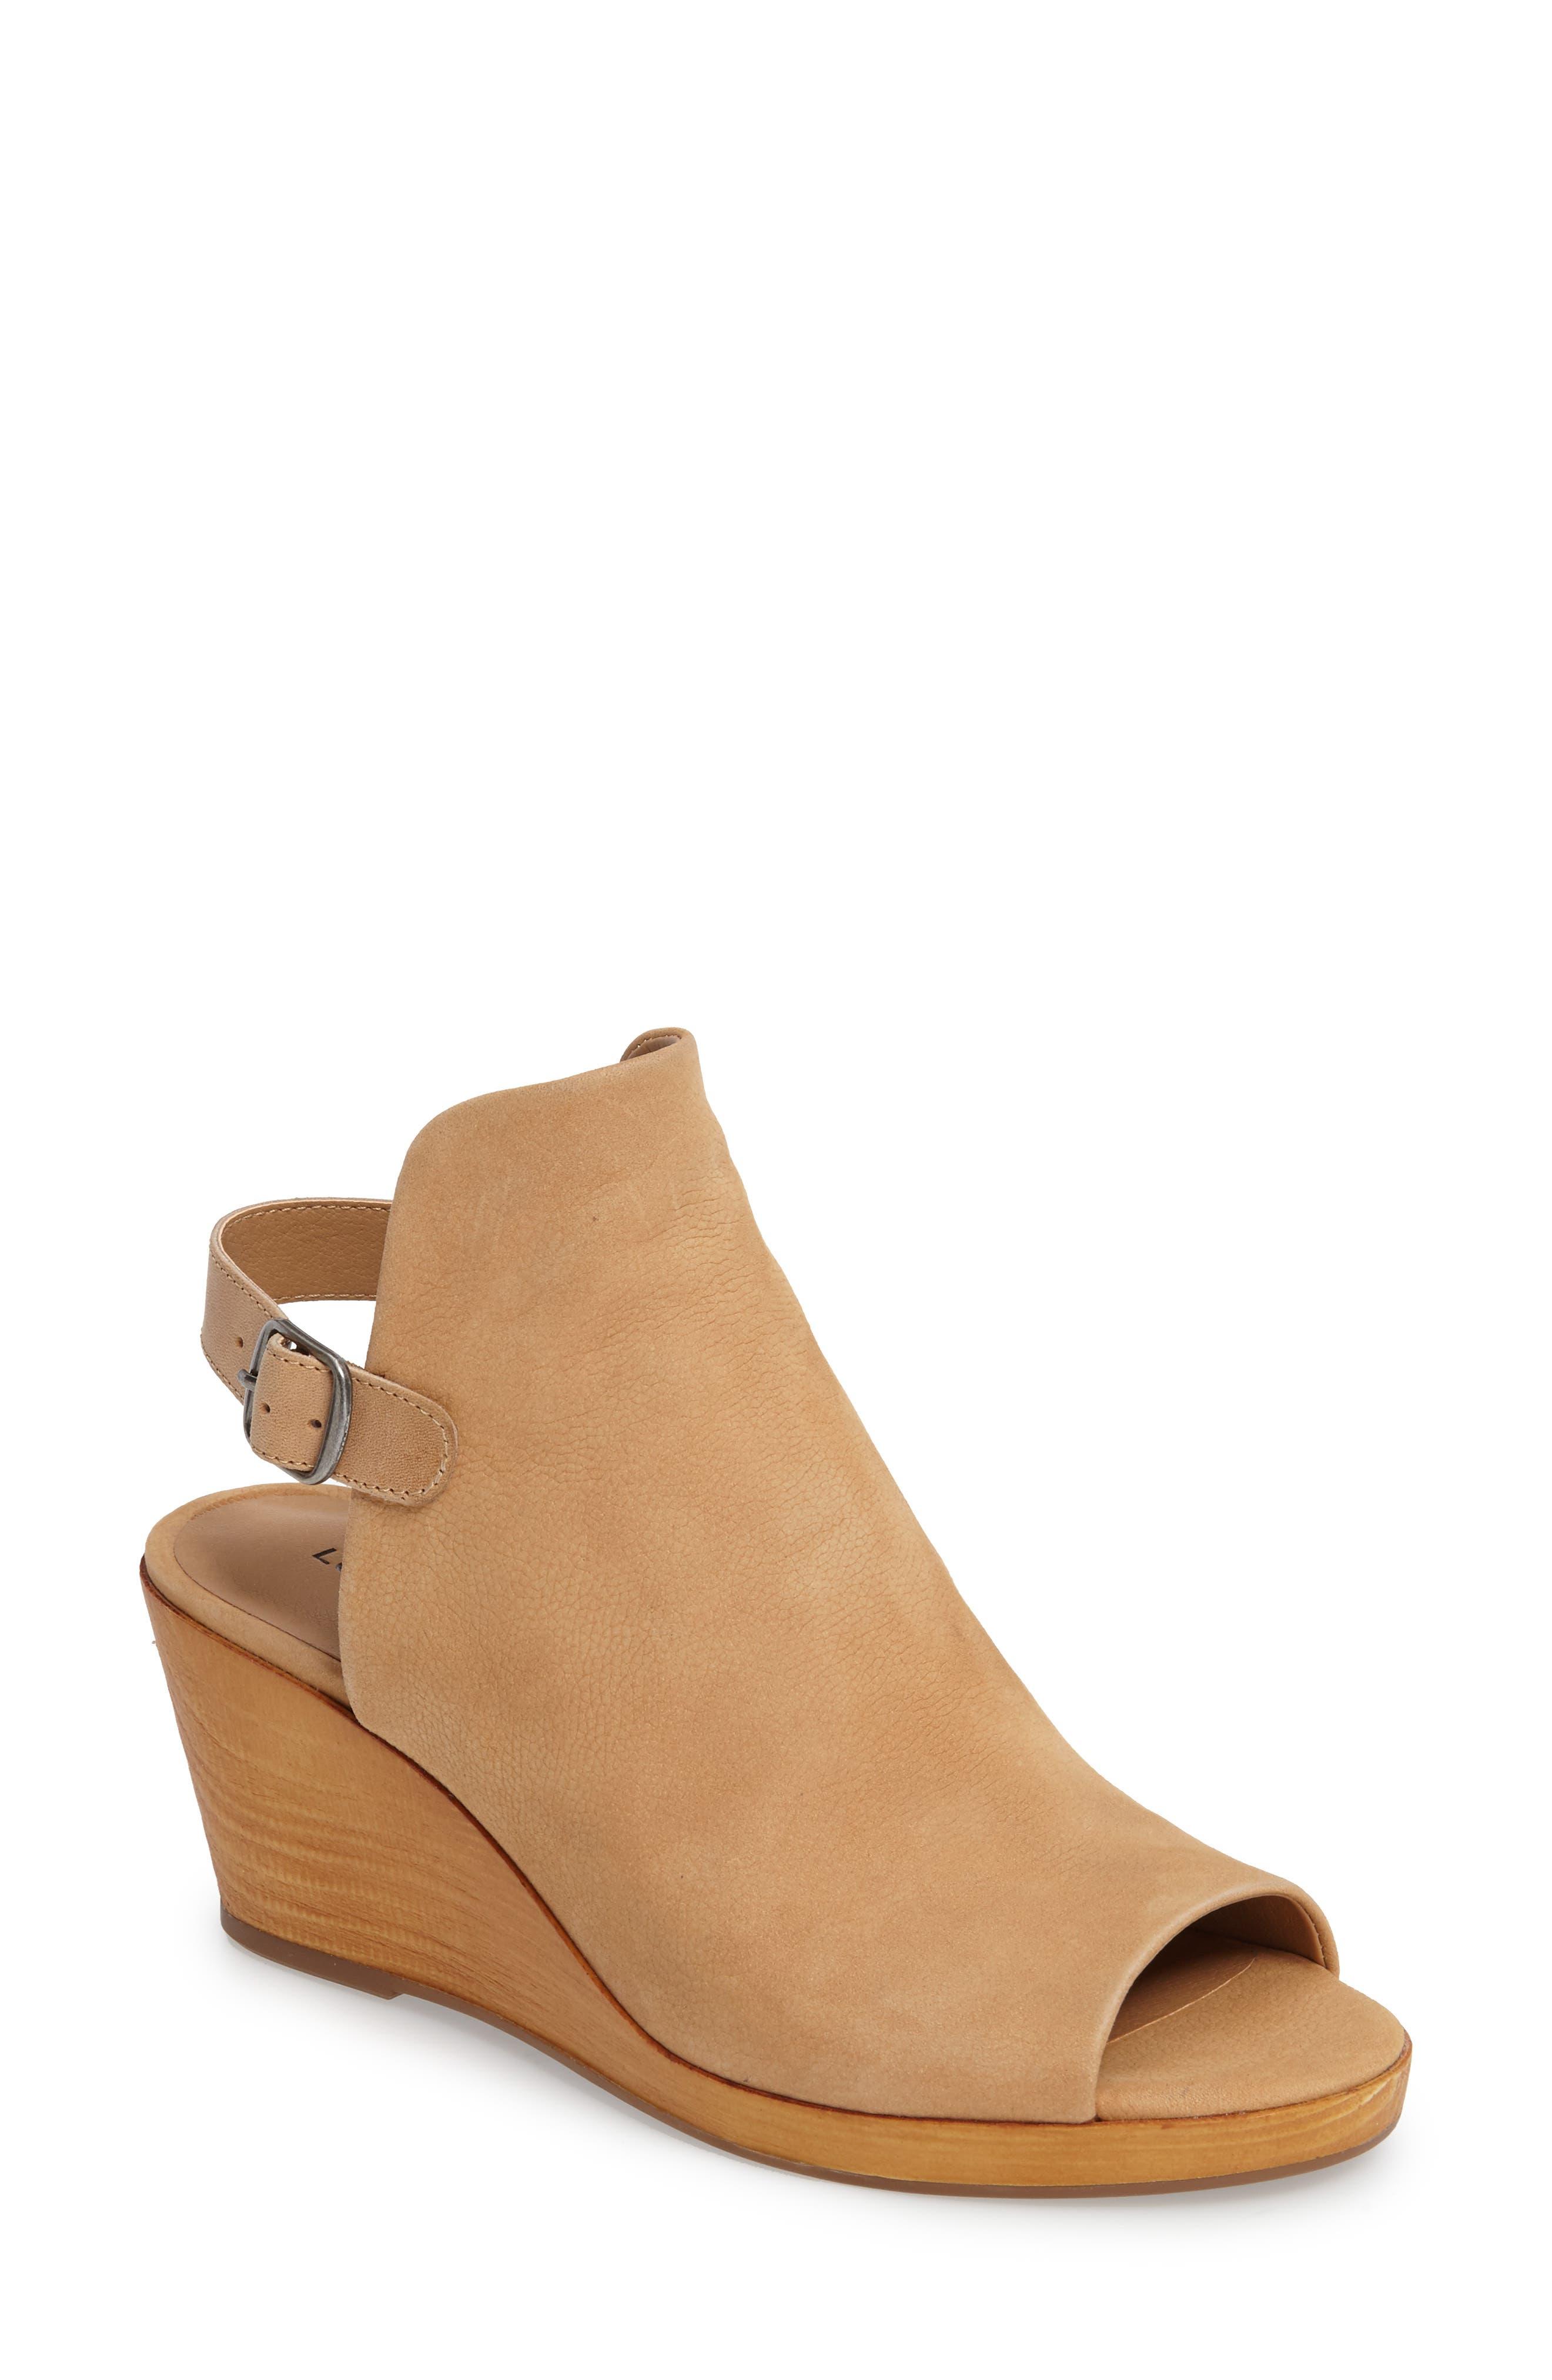 Keralin Wedge Sandal,                         Main,                         color, Glazed Leather